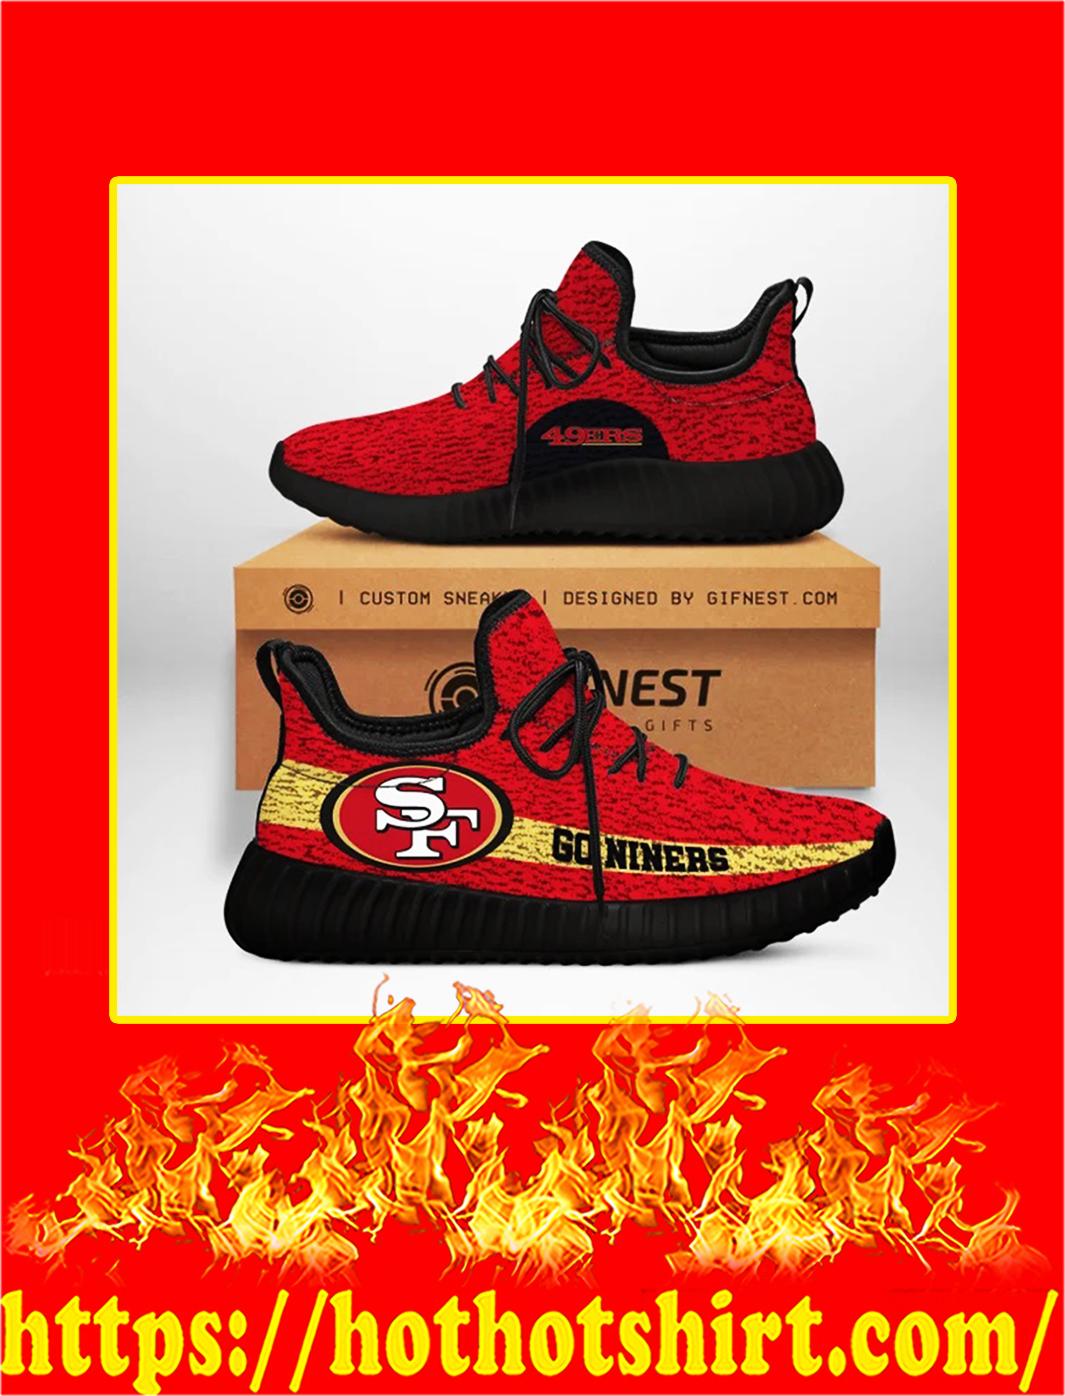 Go Niners San Francisco 49ers NFL Yeezy Sneaker- black